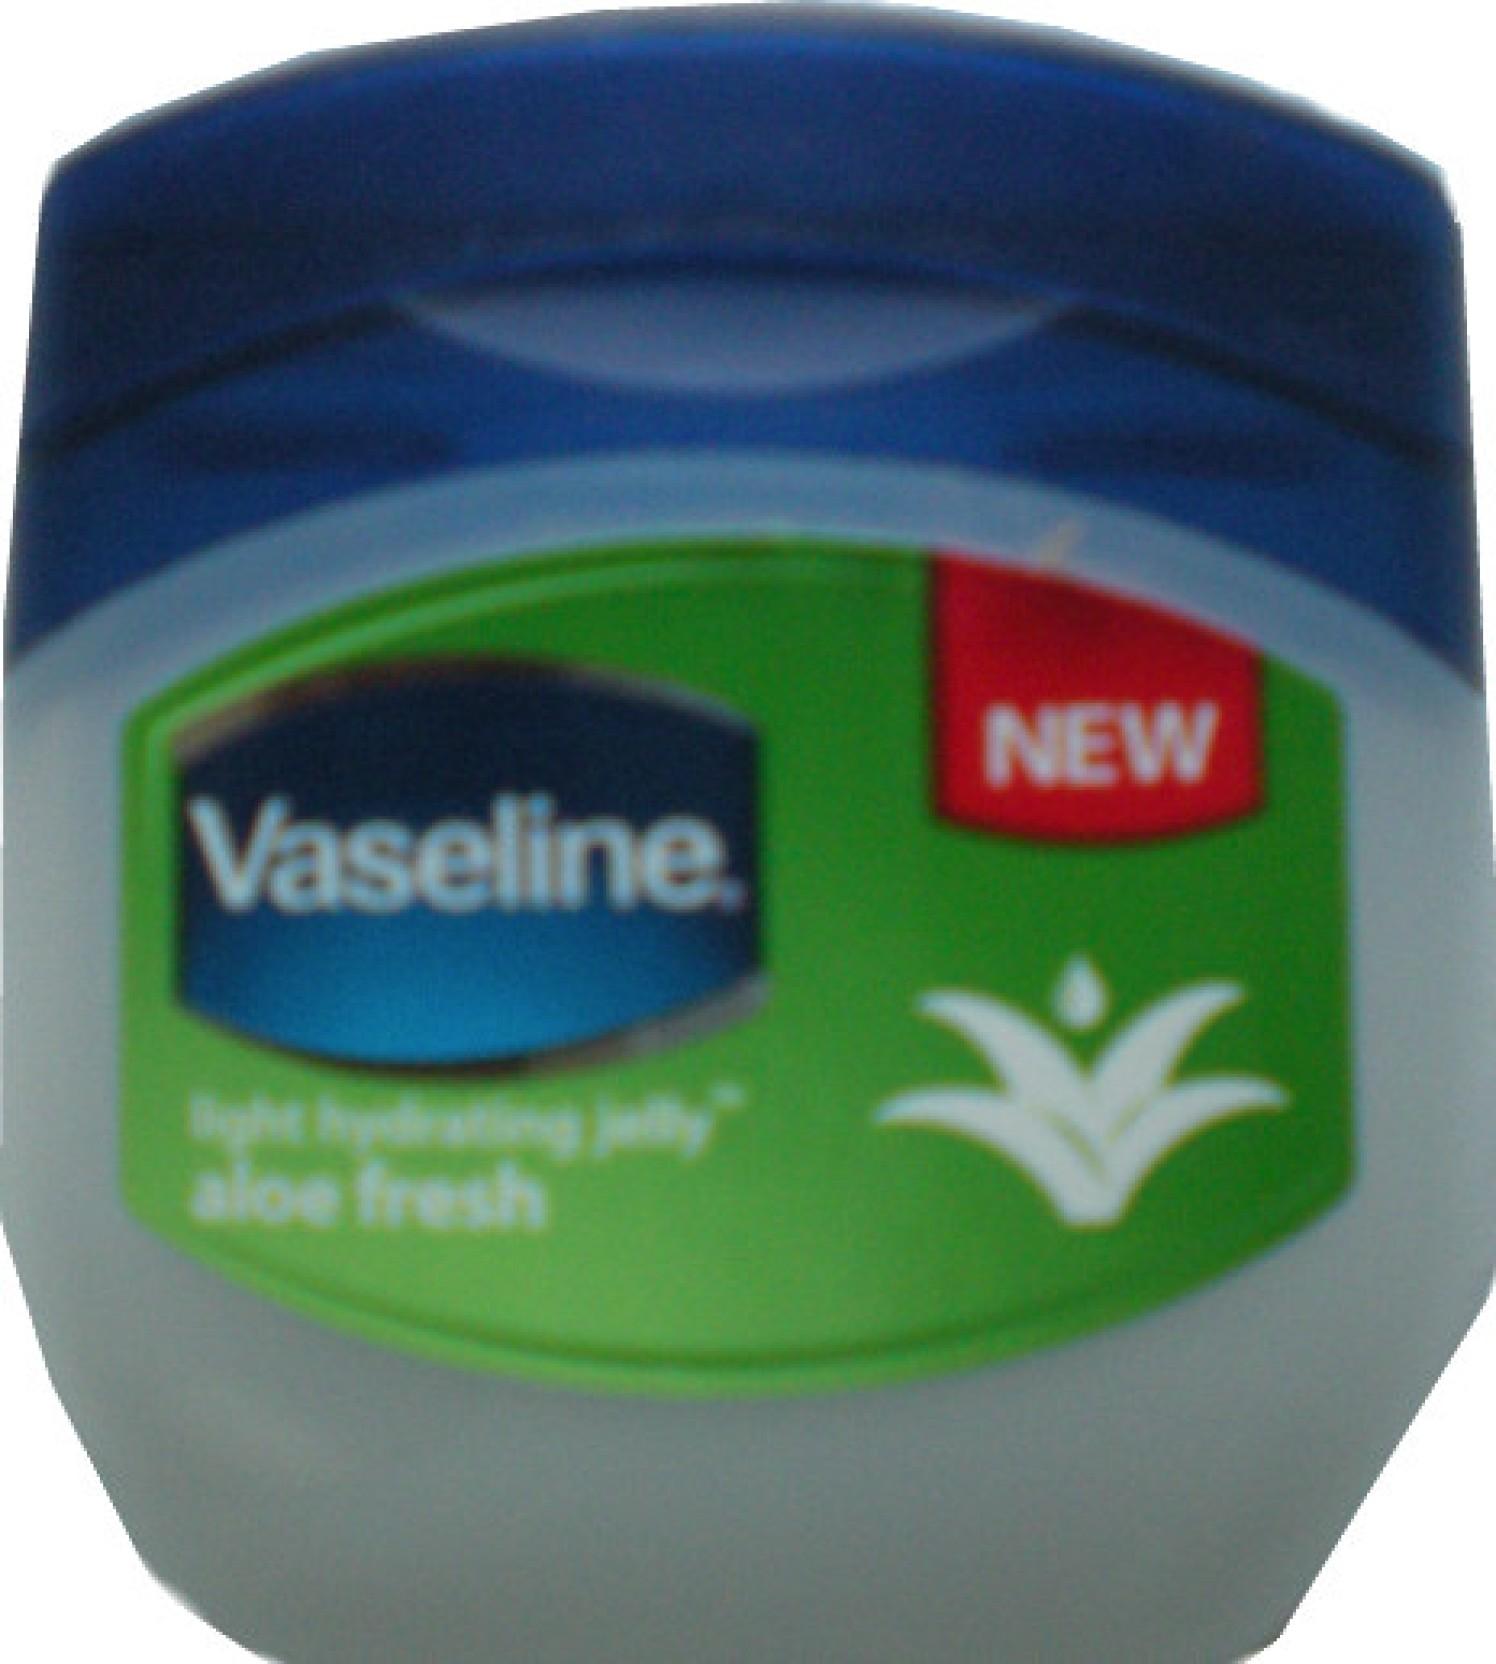 Vaseline Lip Therapy Aloe Vera Price In India Buy Rosy 7g Original Usa 100 Share